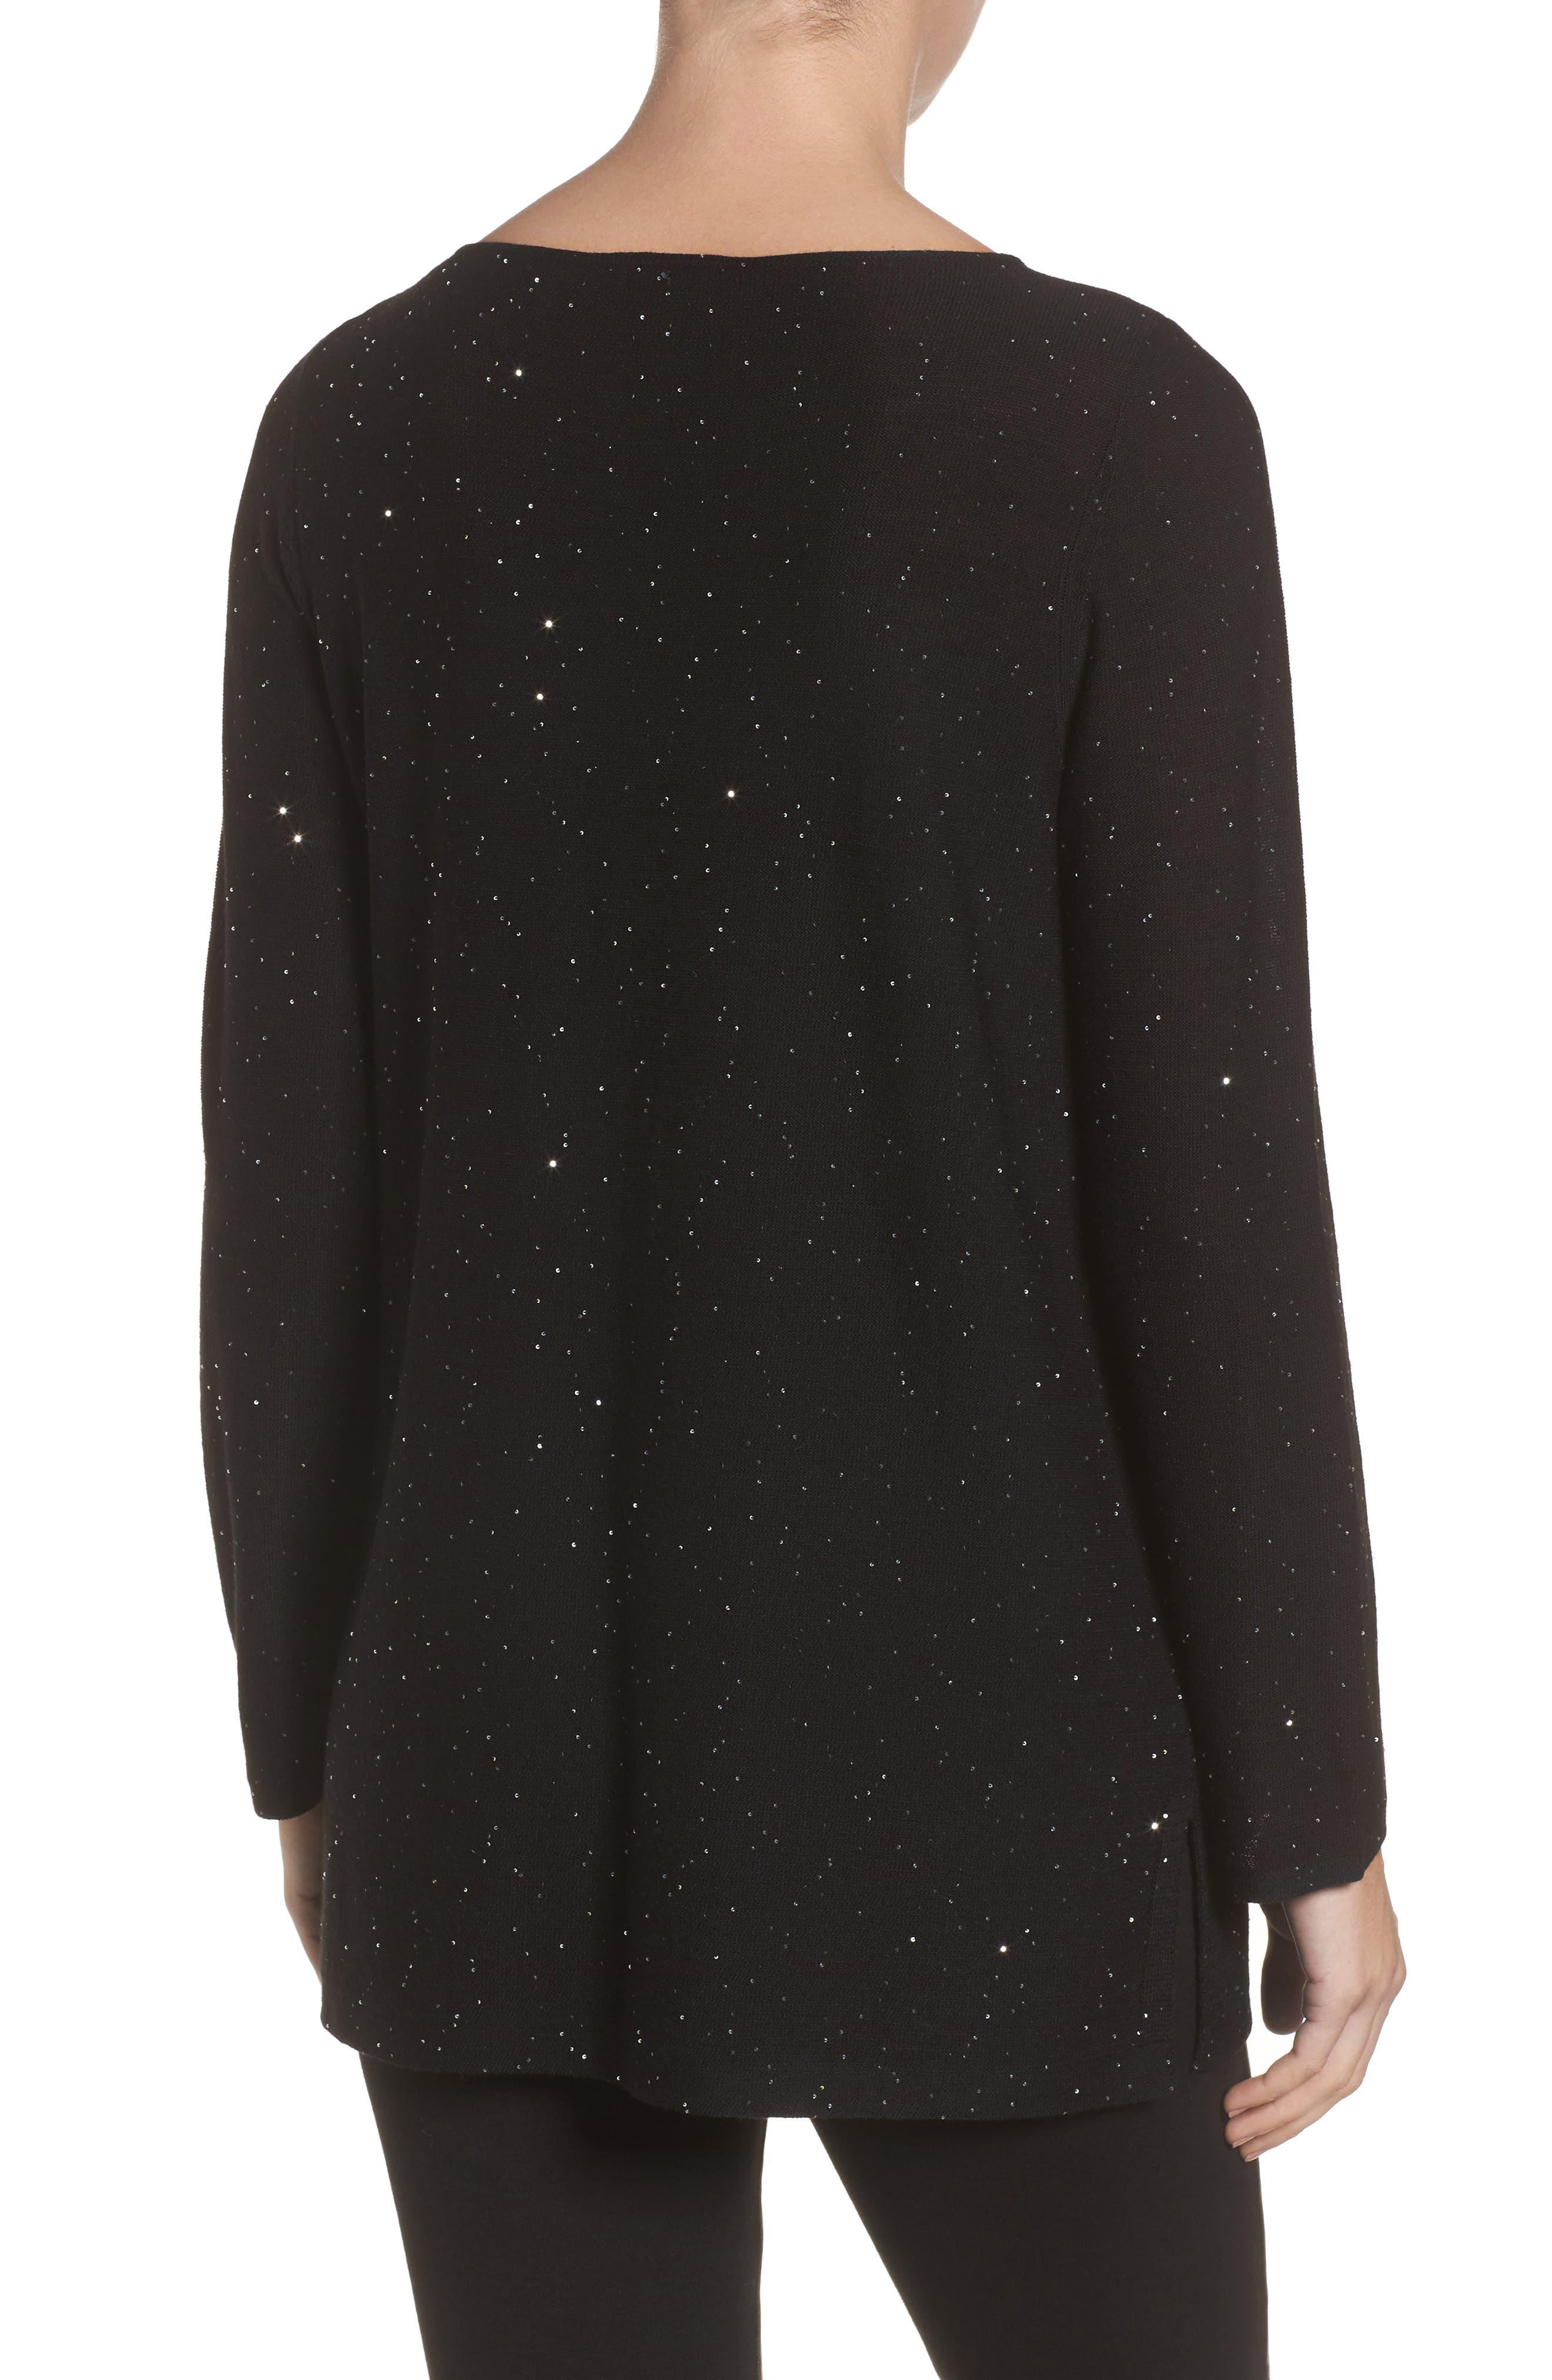 Sequin Merino Wool Sweater,                             Alternate thumbnail 2, color,                             Black